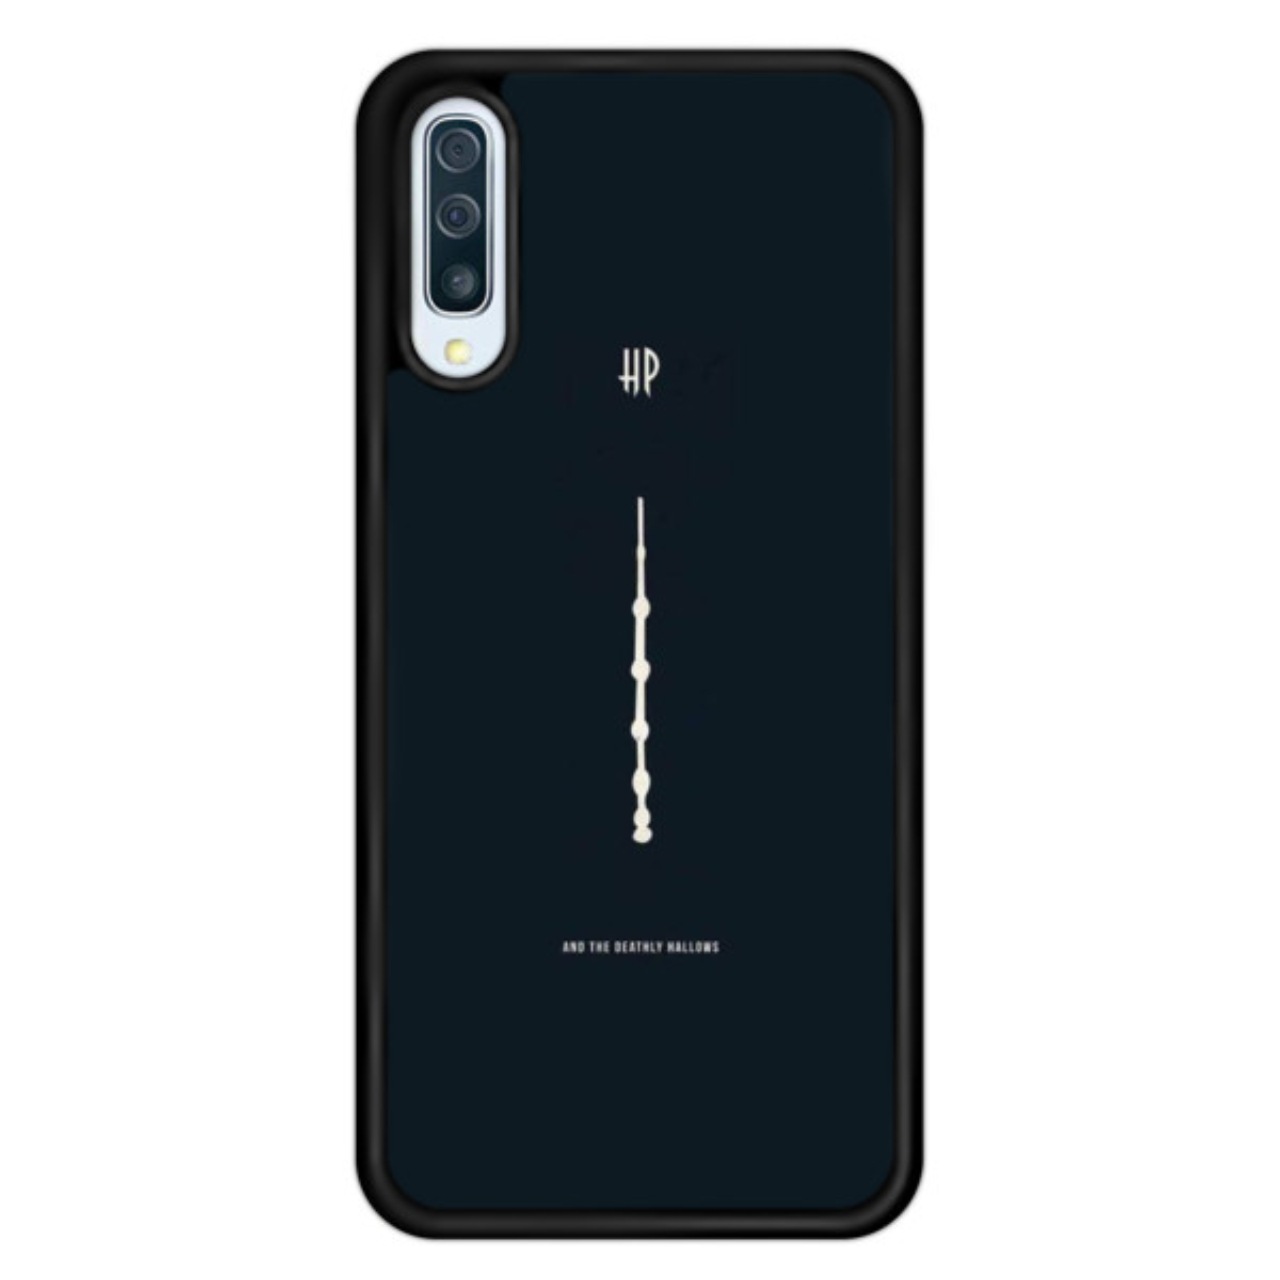 کاور آکام مدل Aa501596 مناسب برای گوشی موبایل سامسونگ Galaxy A50